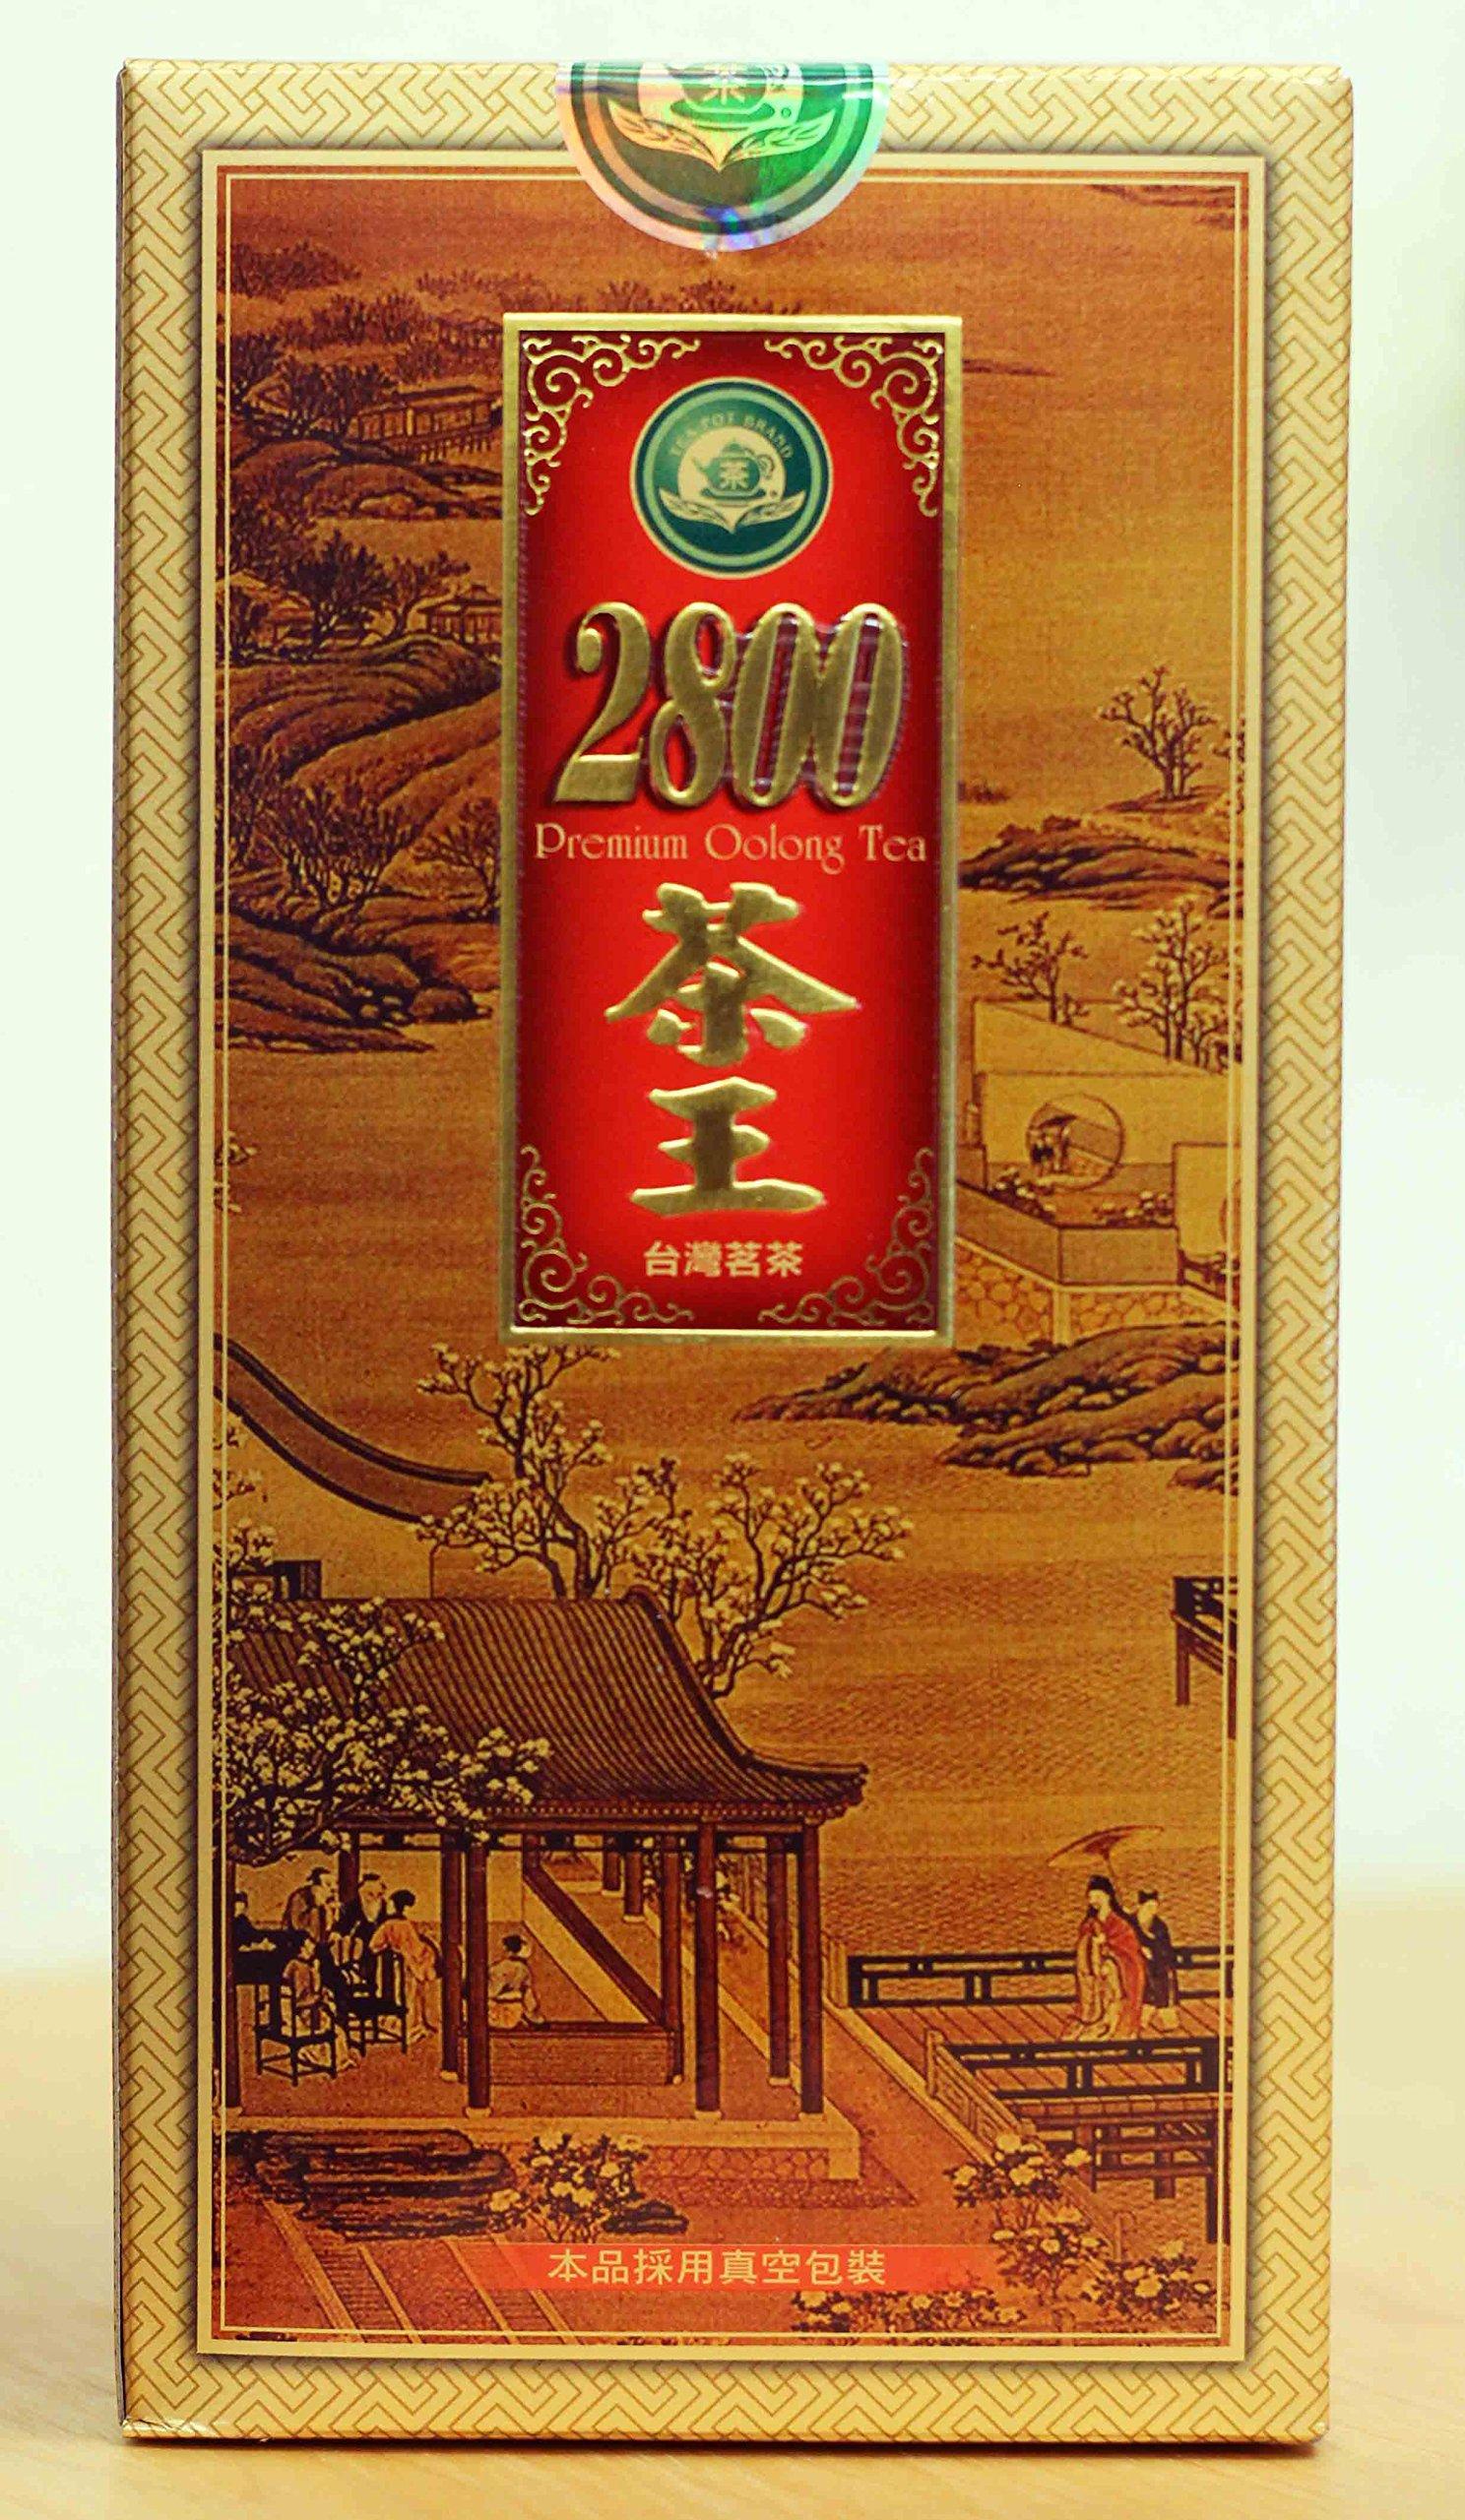 2800 Premium Oolong Tea (300g, 10.6oz) by the teapot company